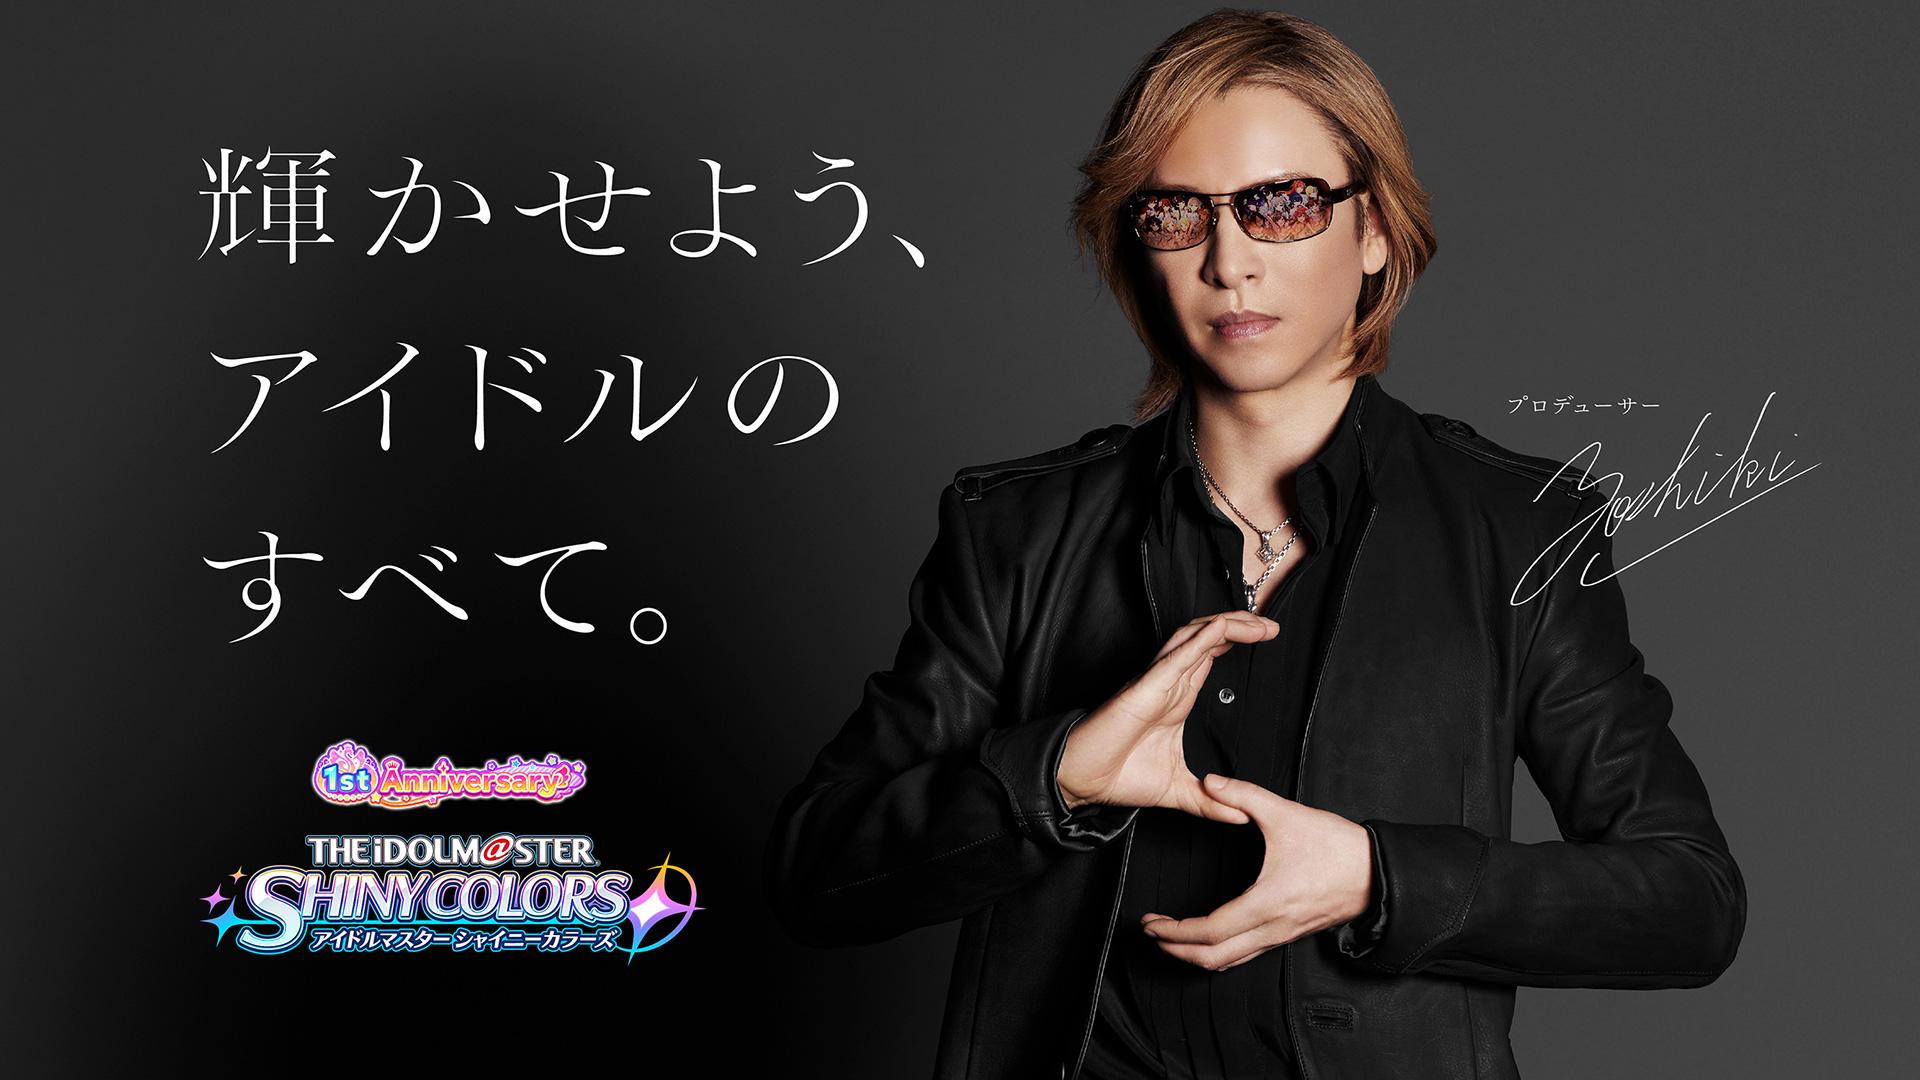 JRock247-Yoshiki-Idolmaster-Shiny-Colors-2019-CM-2A